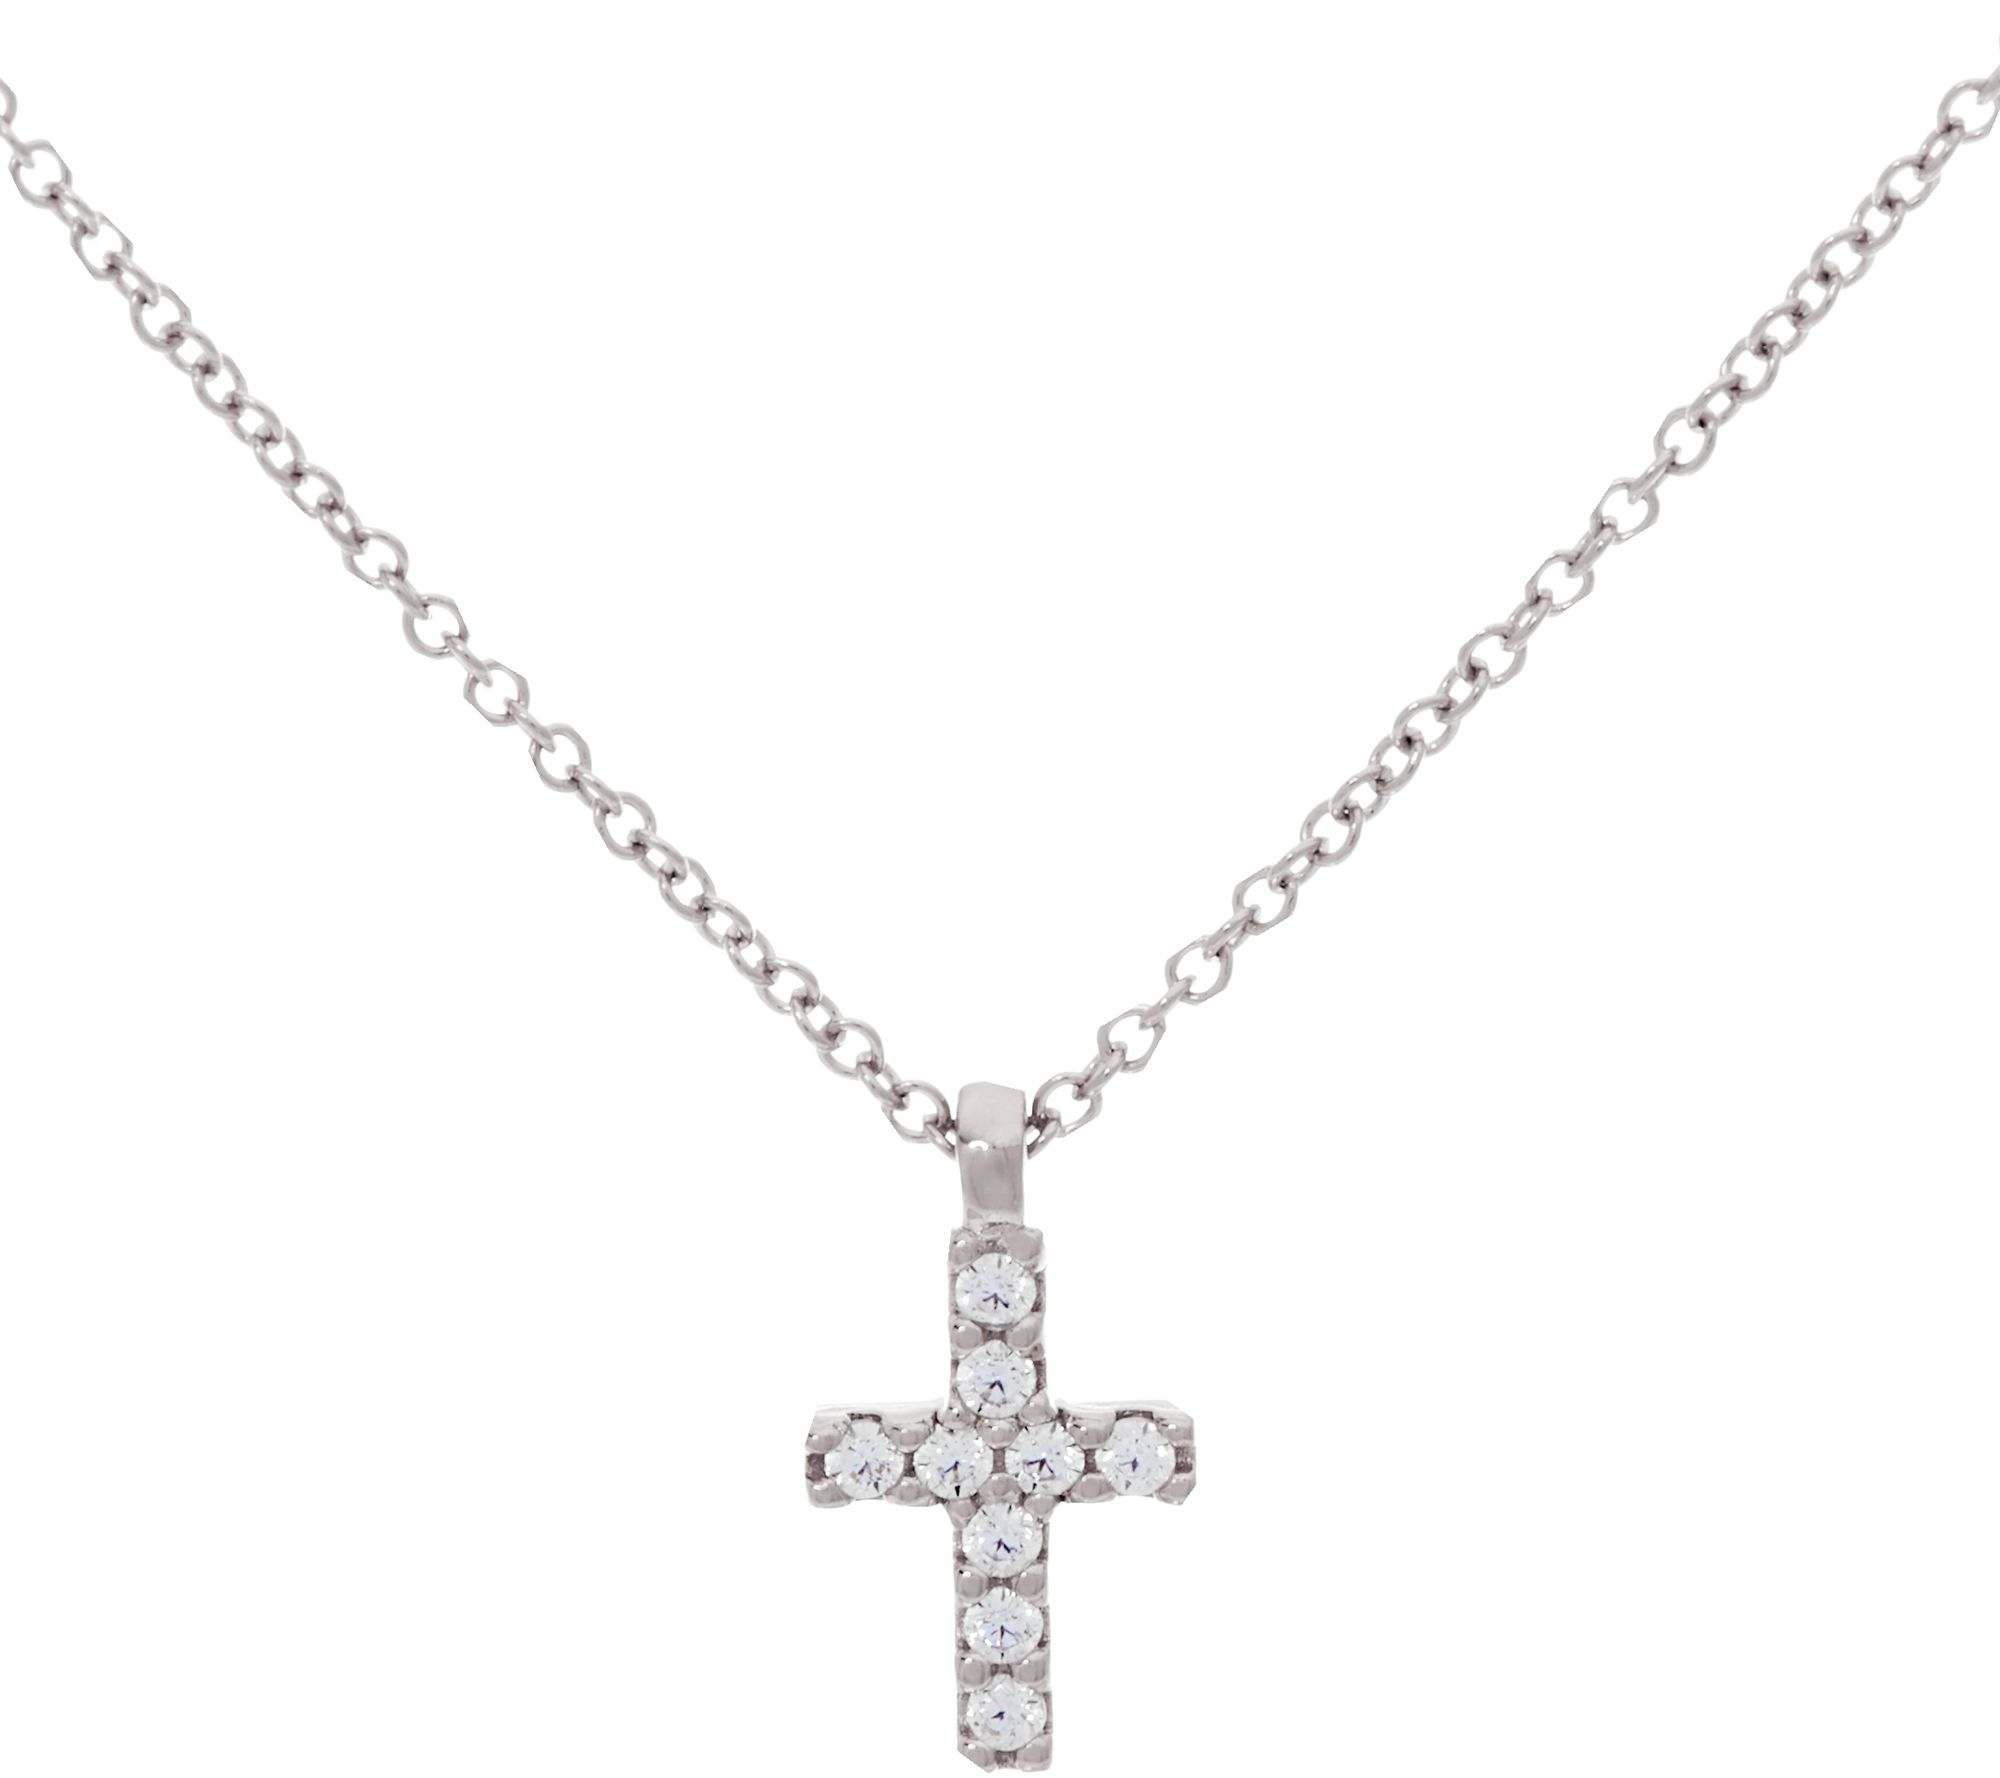 Diamonique Cross Pendant w Chain Sterling or 14K Clad Page 1